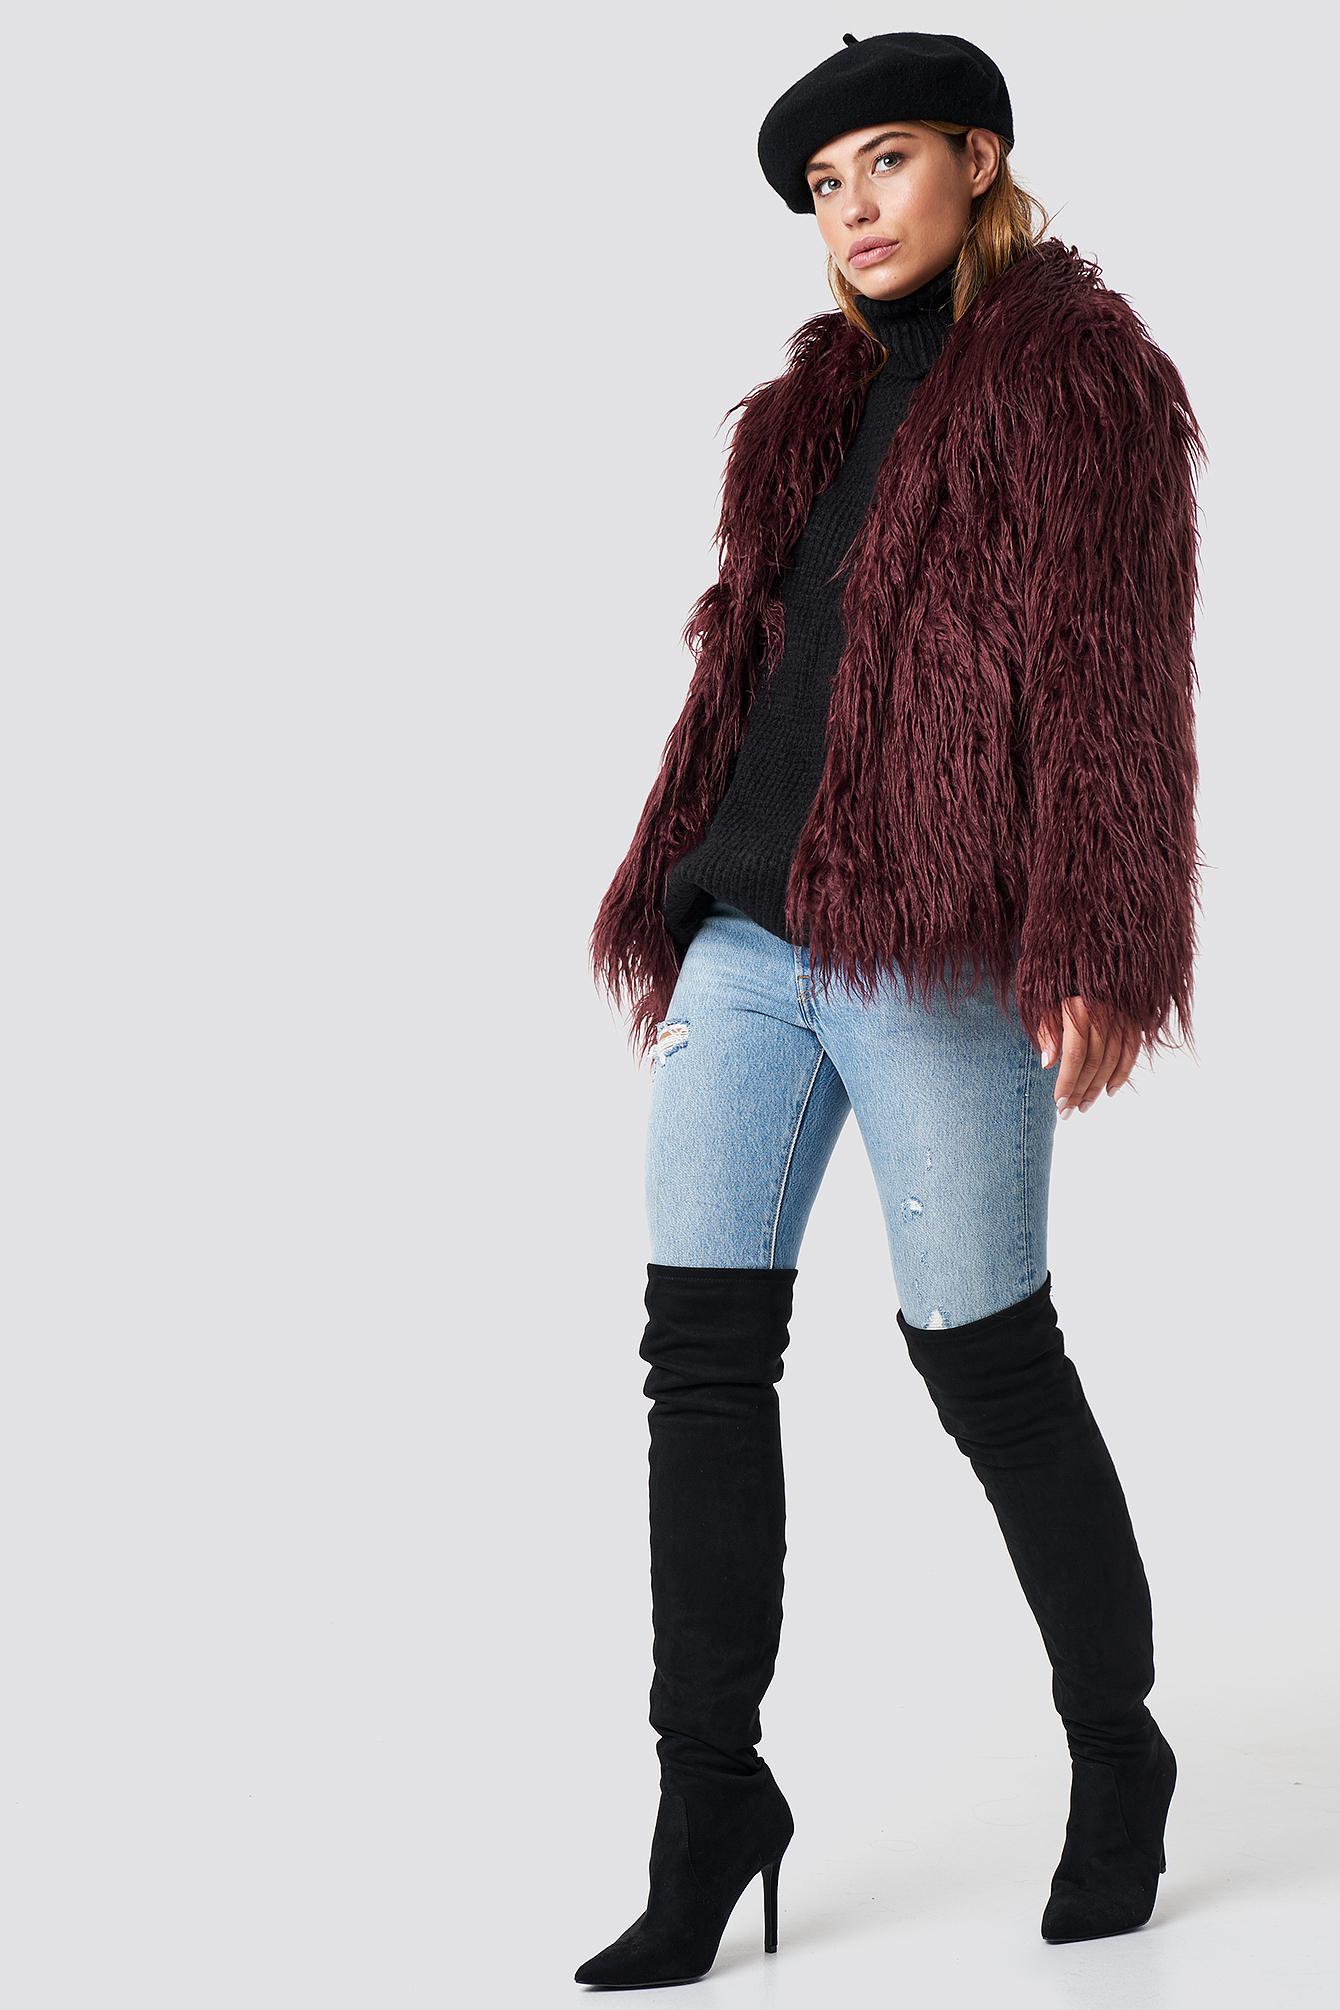 linn ahlborg x na-kd -  Fluffy Faux Fur Jacket - Red,Purple